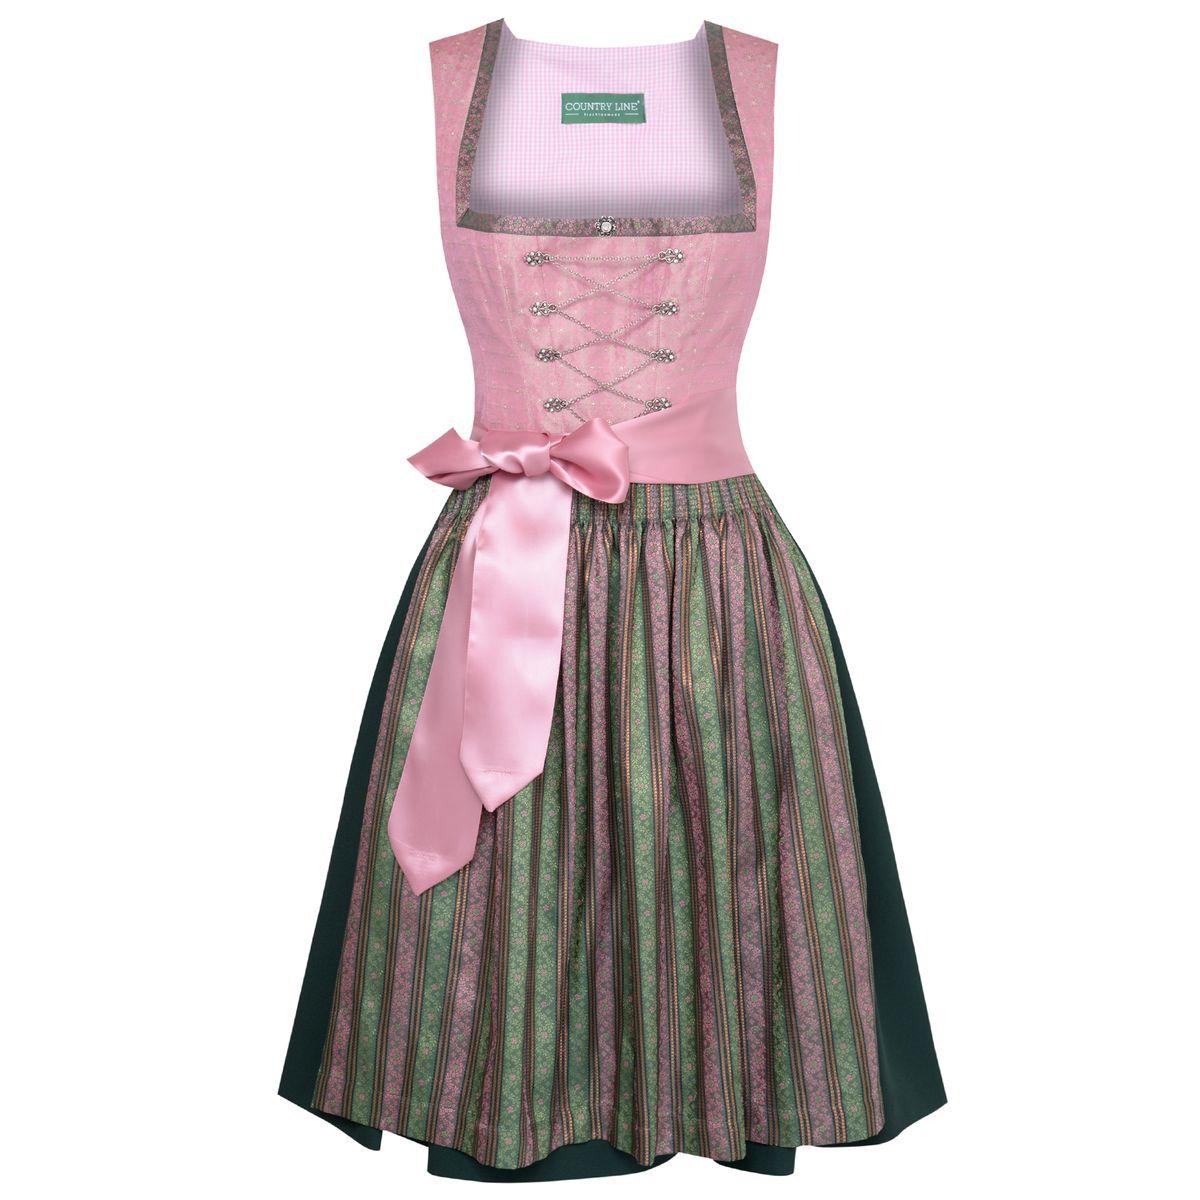 midi dirndl isabell in rosa von country line damen dirndl midi dirndl. Black Bedroom Furniture Sets. Home Design Ideas